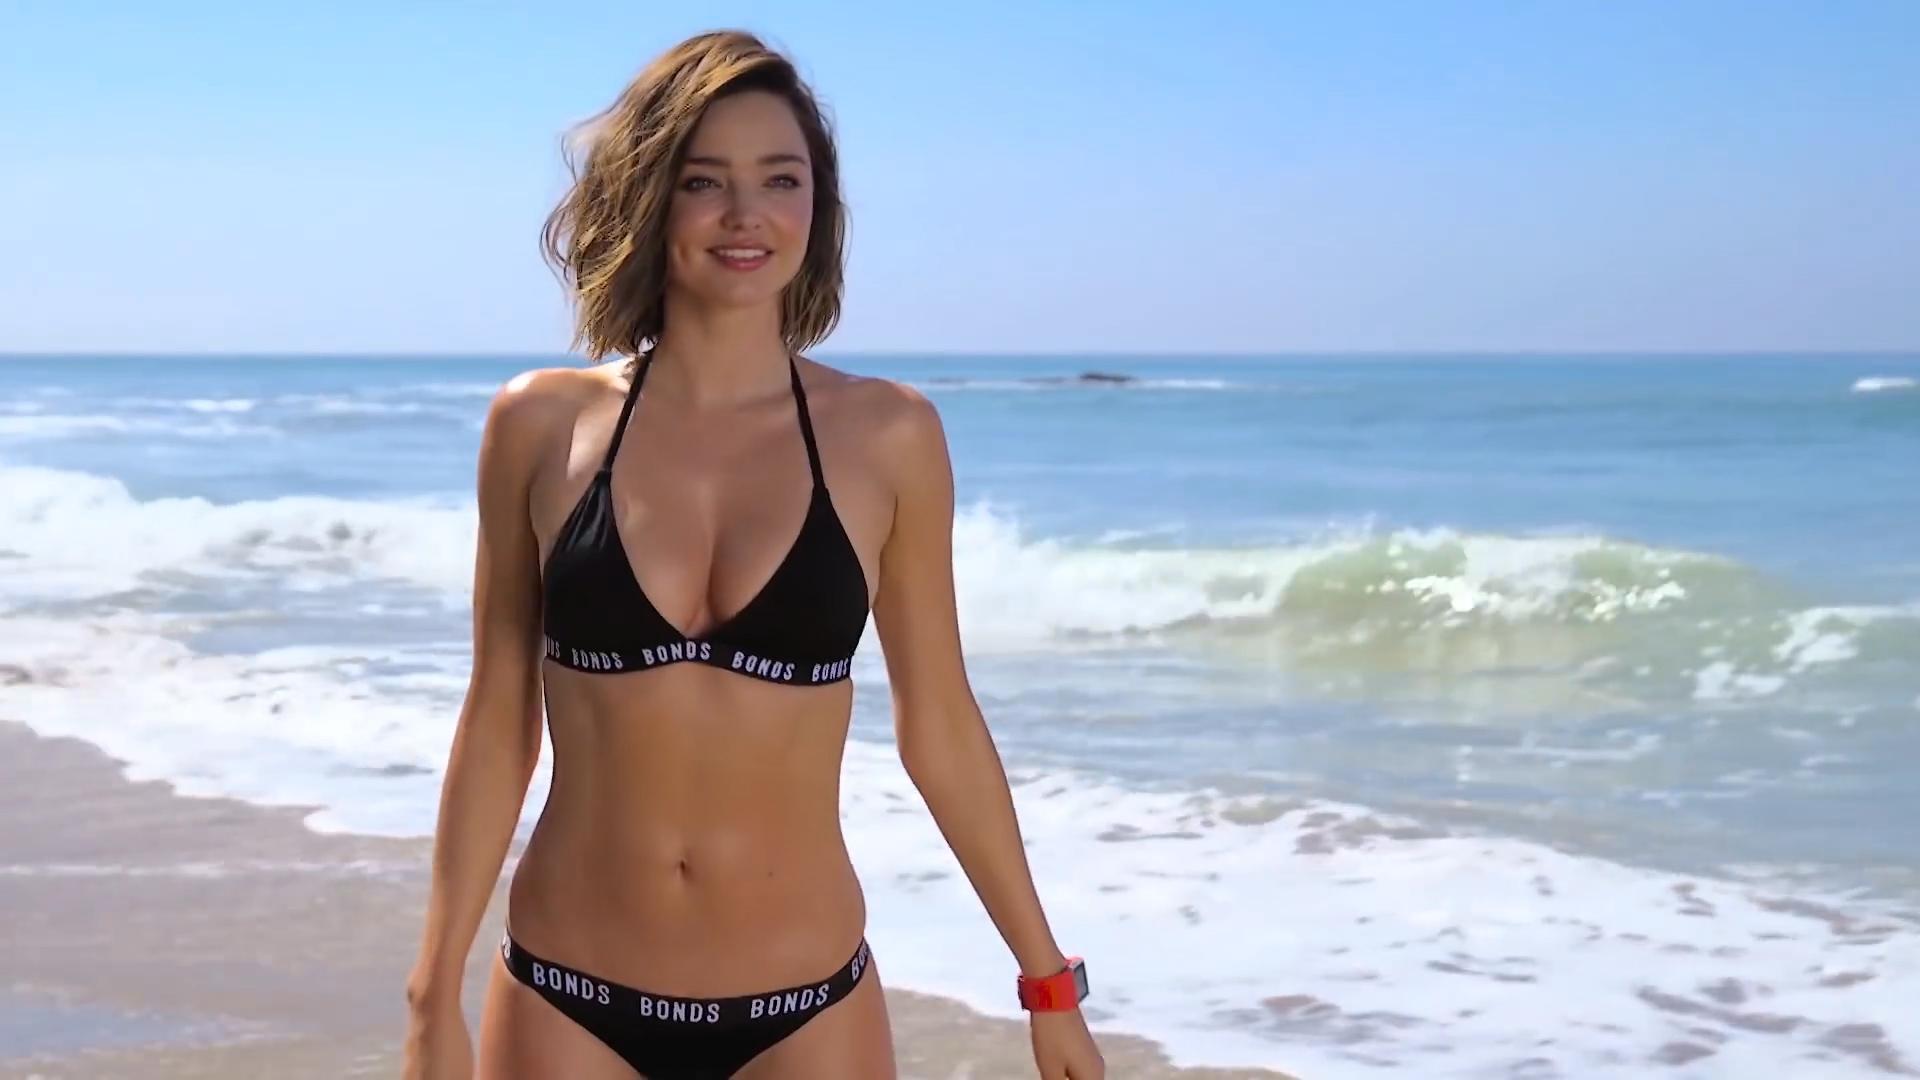 f6f64c0a98368 Miranda kerr bonds swim shoot september gotceleb jpg 1920x1080 Miranda kerr  swimsuit